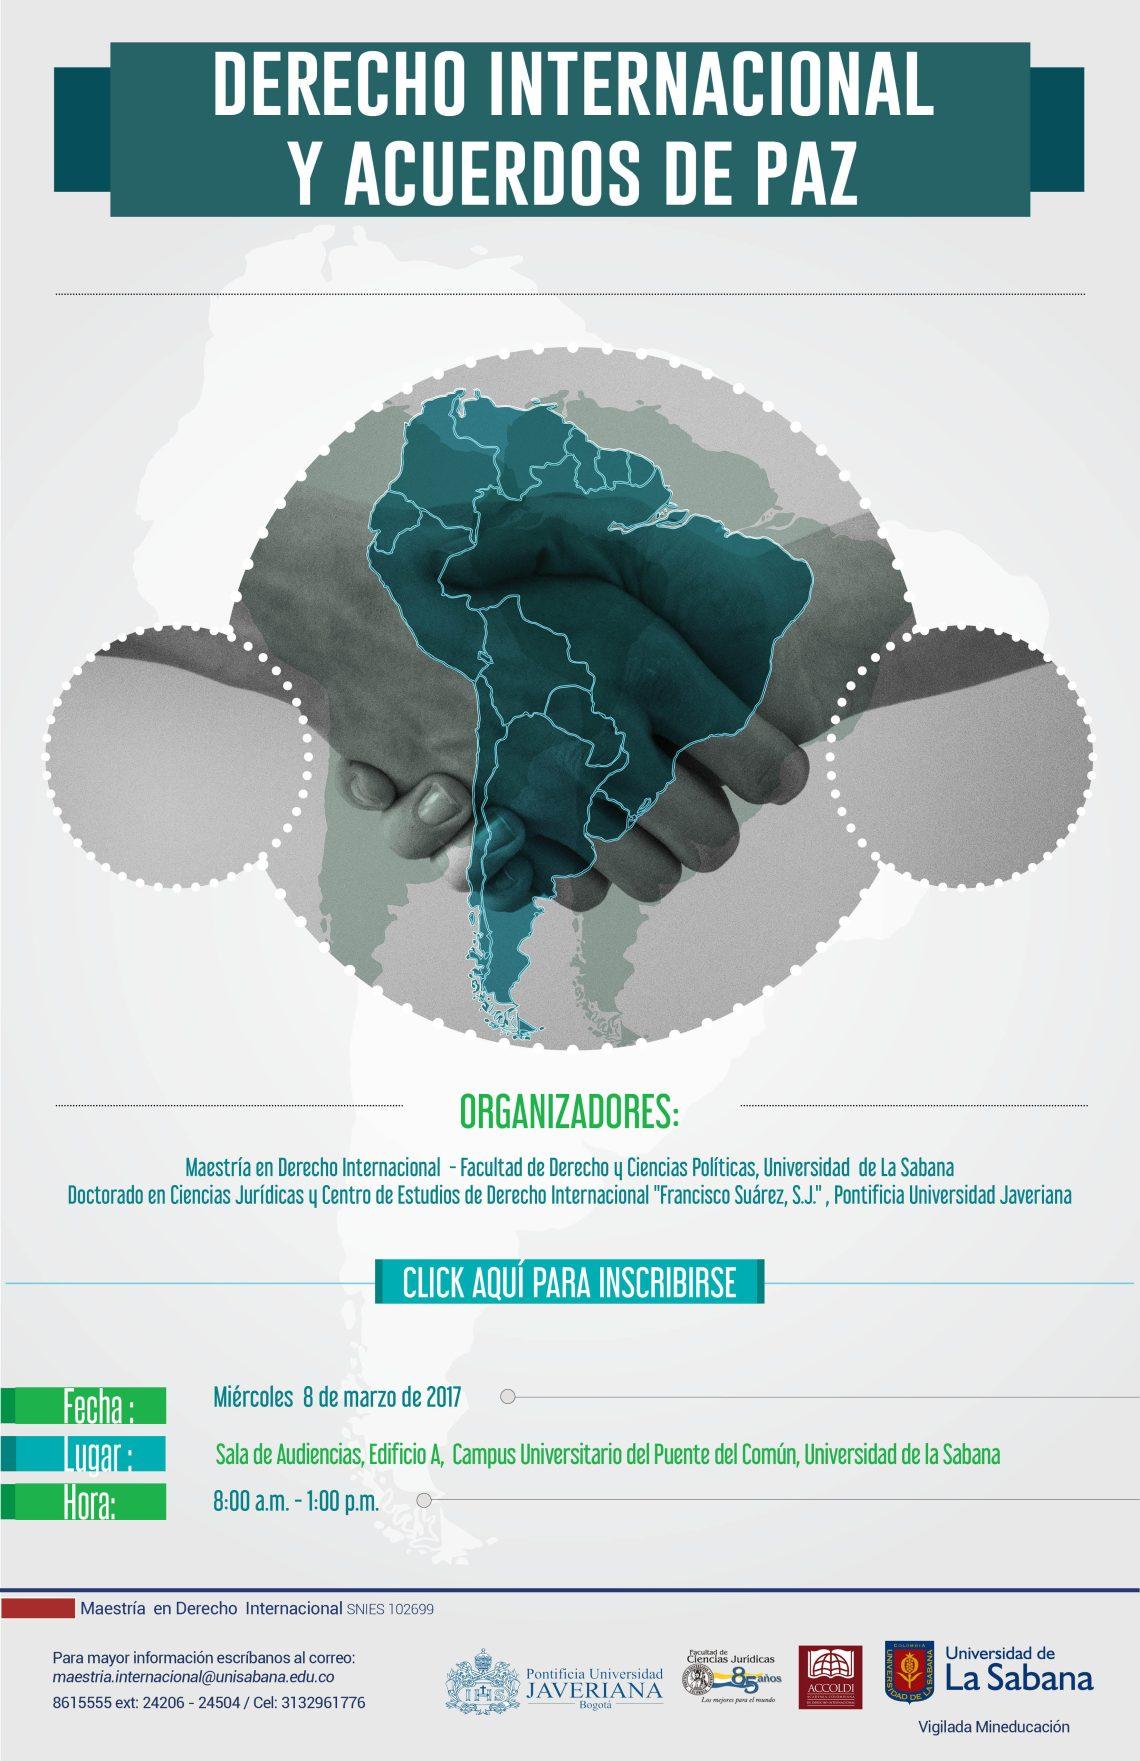 acedi-cilsa-maestria-derecho-internacional-sabana-foro-paz-intl-2017